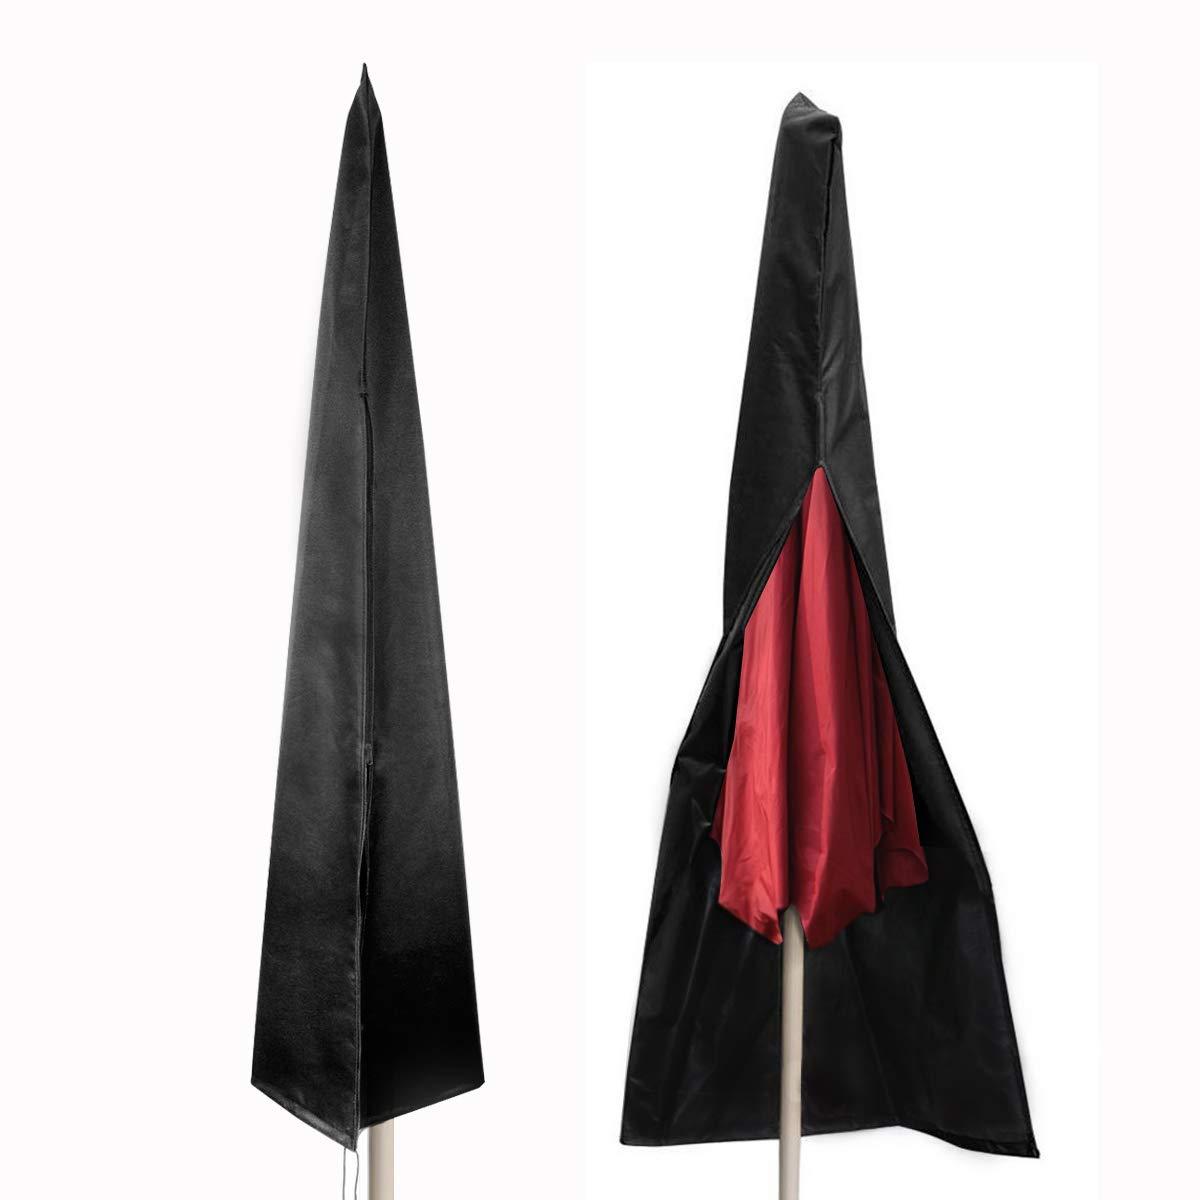 bedee Parasol Cover, Umbrella Cover Garden Parasol Cover Waterproof Oxford Fabric Patio Umbrella Canopy Protection Cover for Outdoor Umbrella Diameter 2.4m/2.7m/3m/3.5m